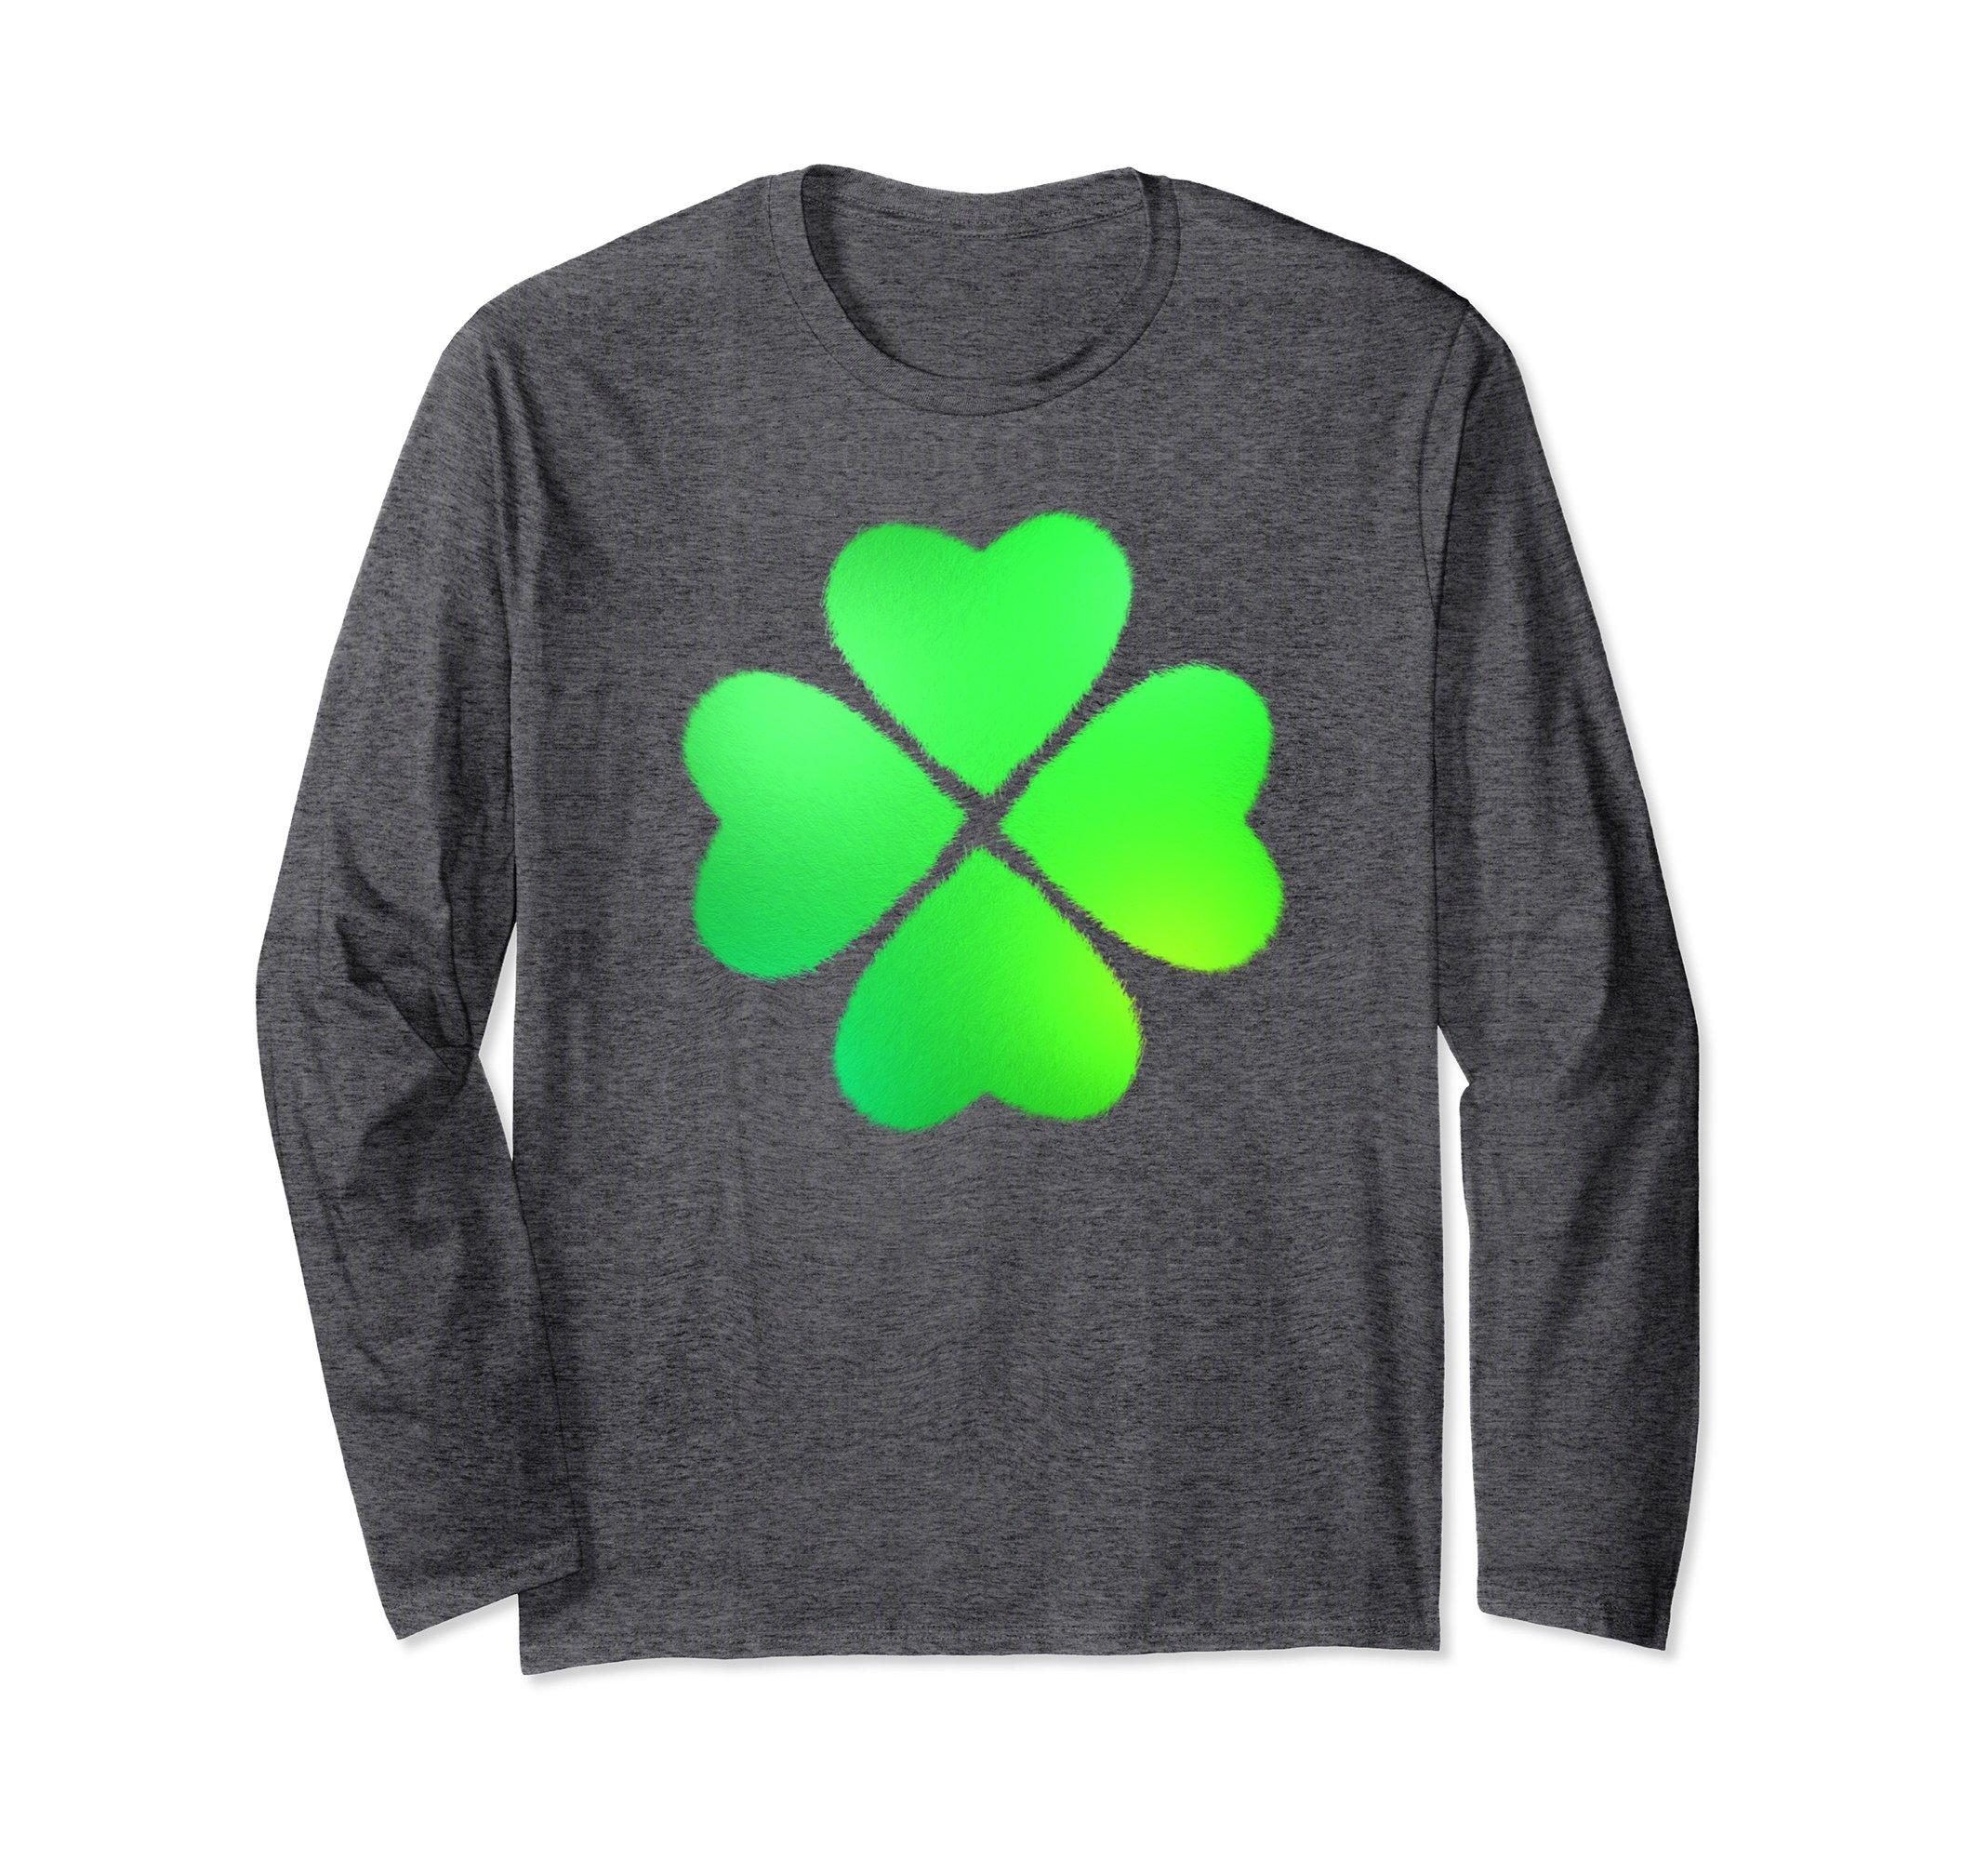 Unisex Earth Day Shirt - Environmentalist t Shirt - Men Women Kids Small Dark Heather